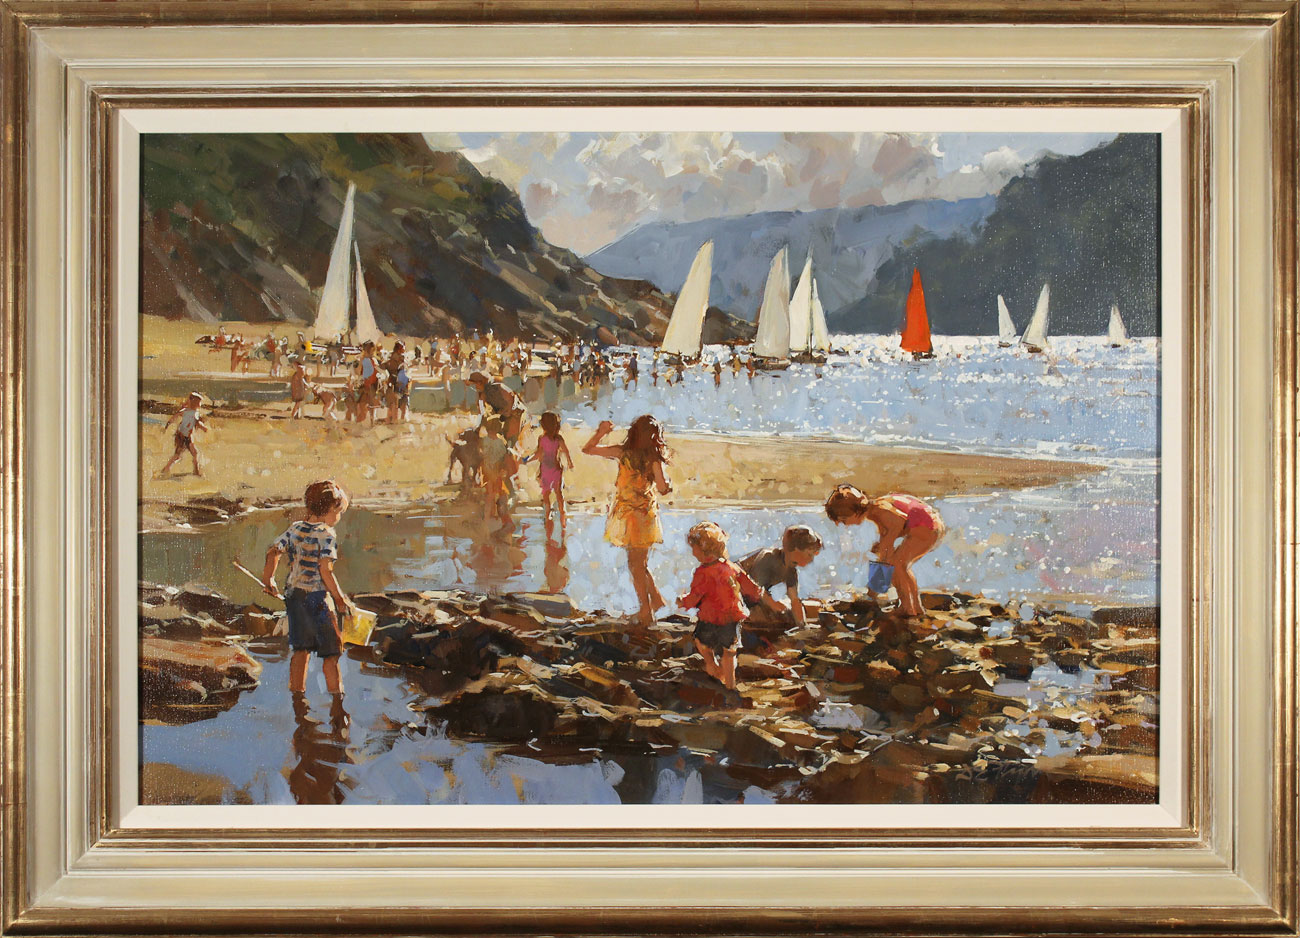 Dianne Flynn, Original acrylic painting on canvas, Ebbtide, Salcombe Click to enlarge